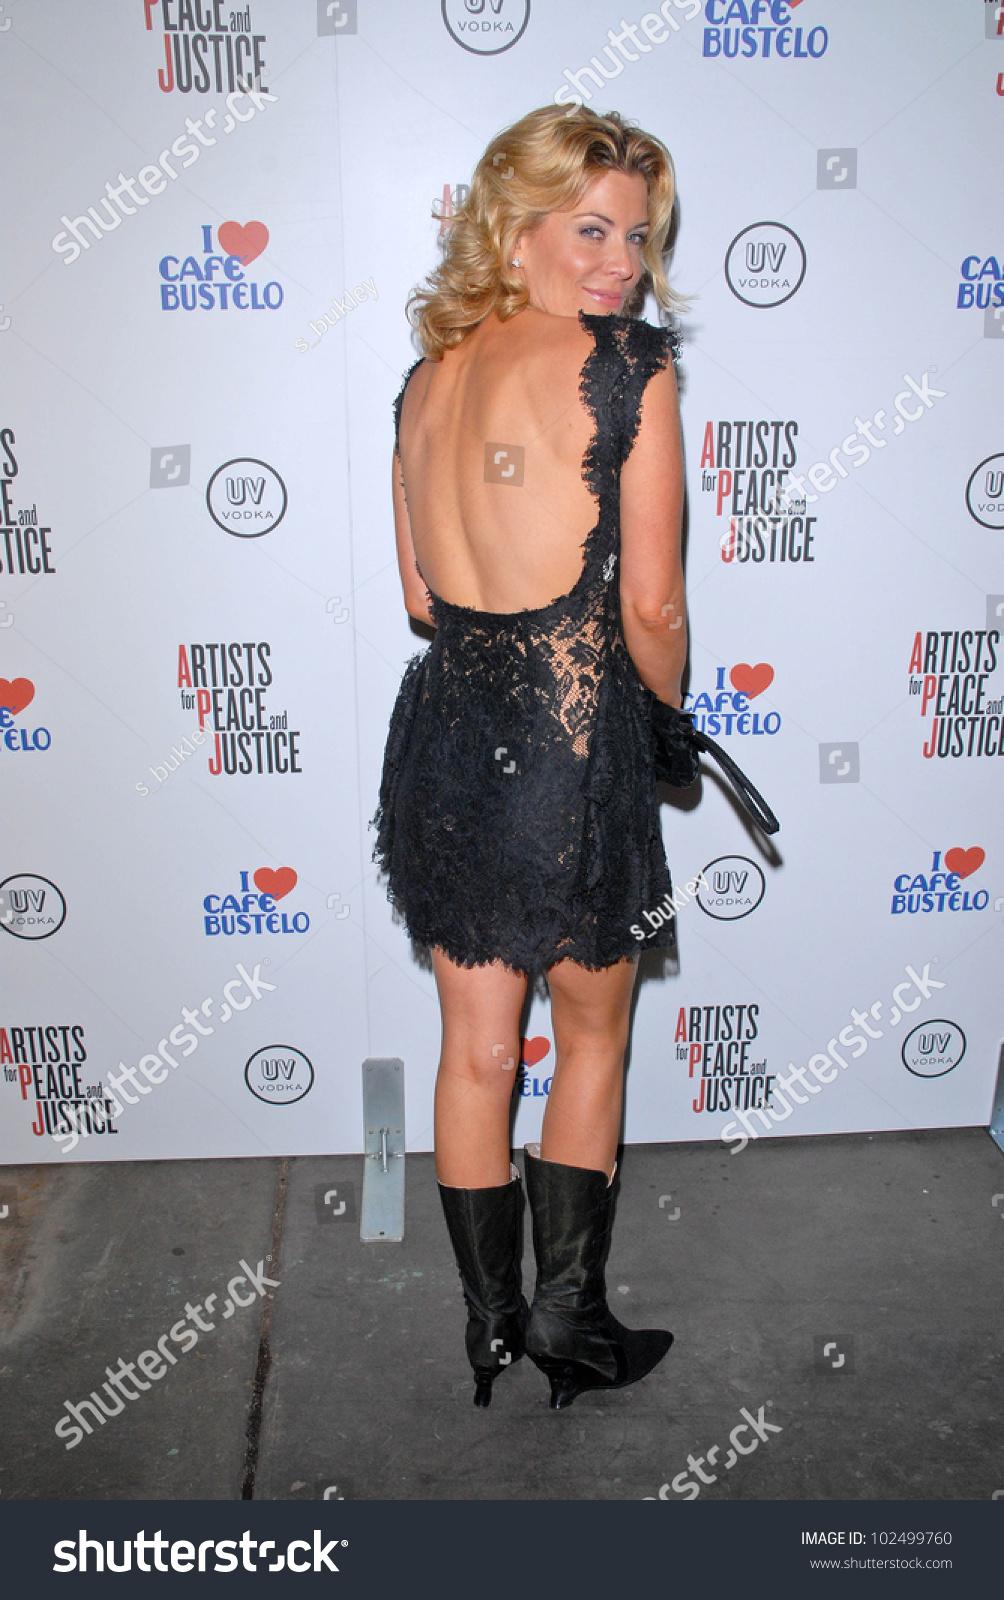 Maria Grazia Cucinotta (born 1968),Ashley Gardner Erotic video Rosie Tenison,Alison Sudol